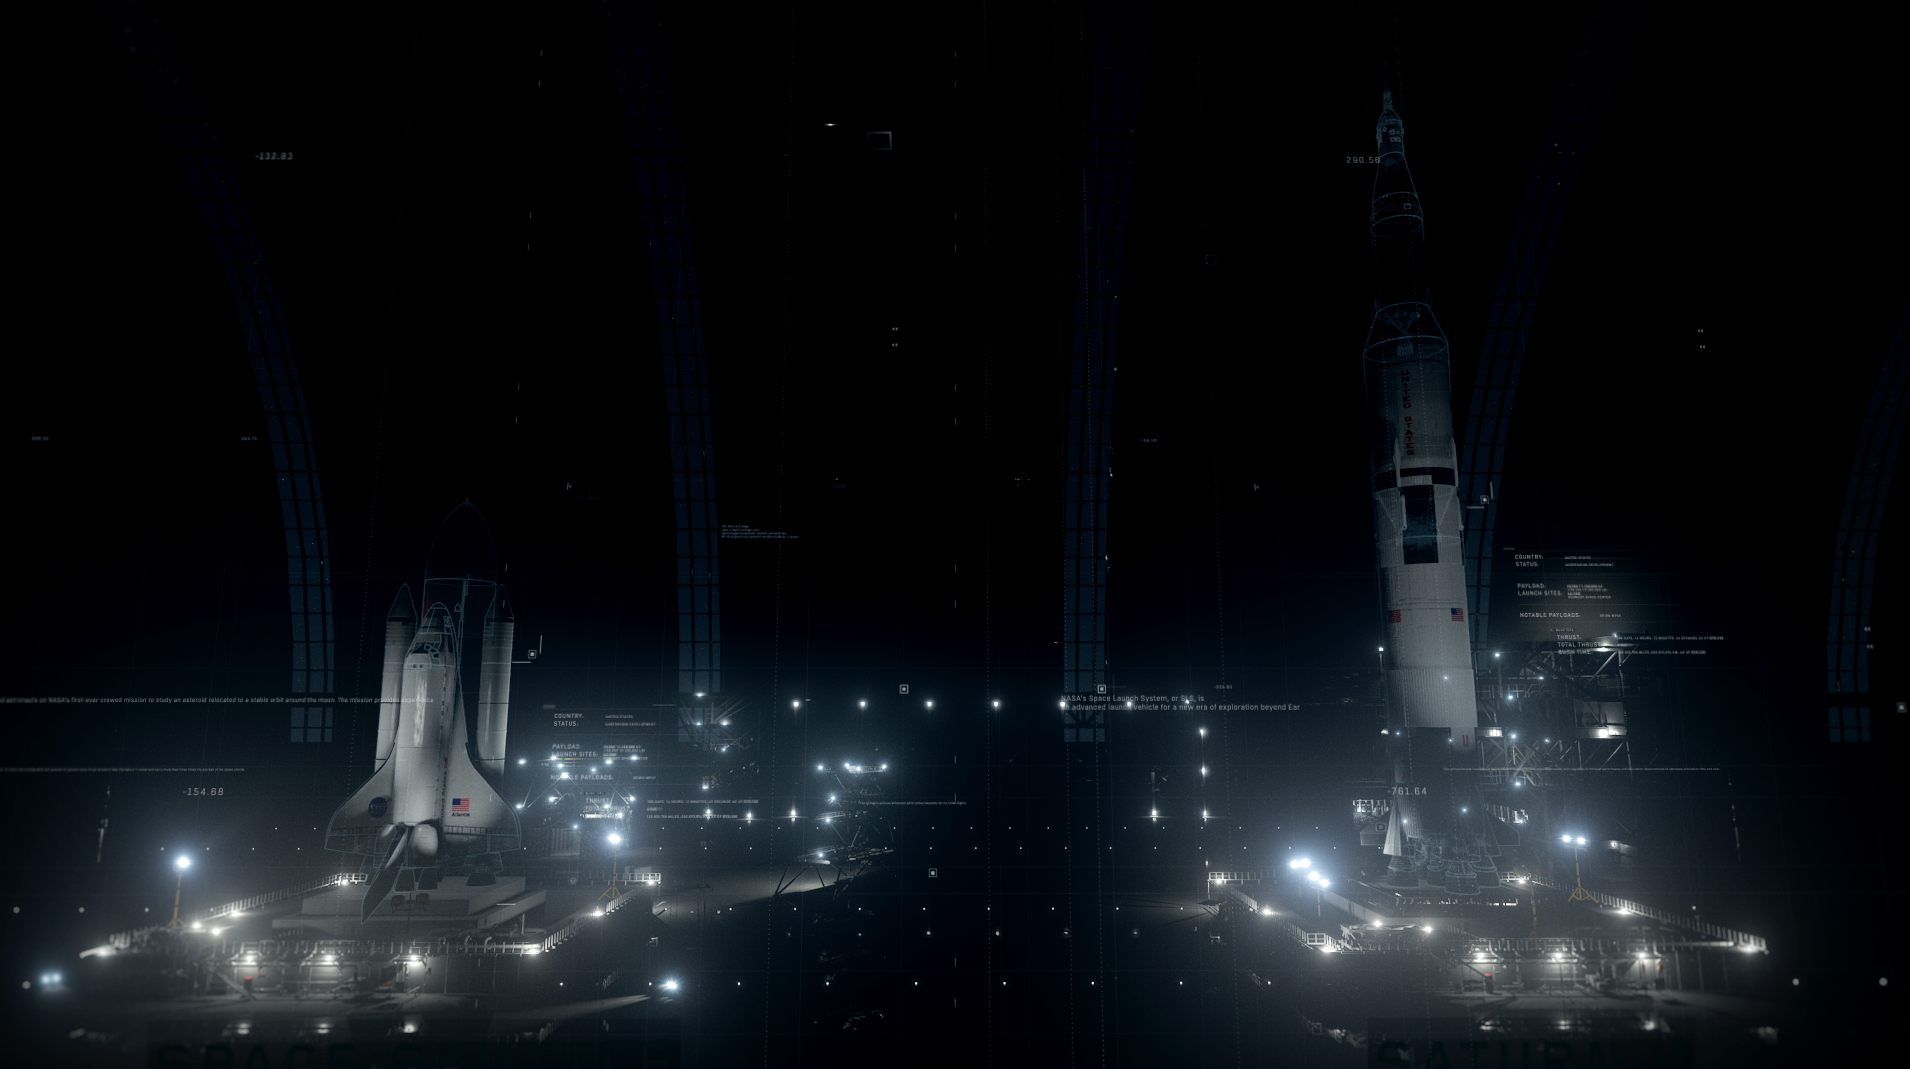 Transitioning into planetarium mode.